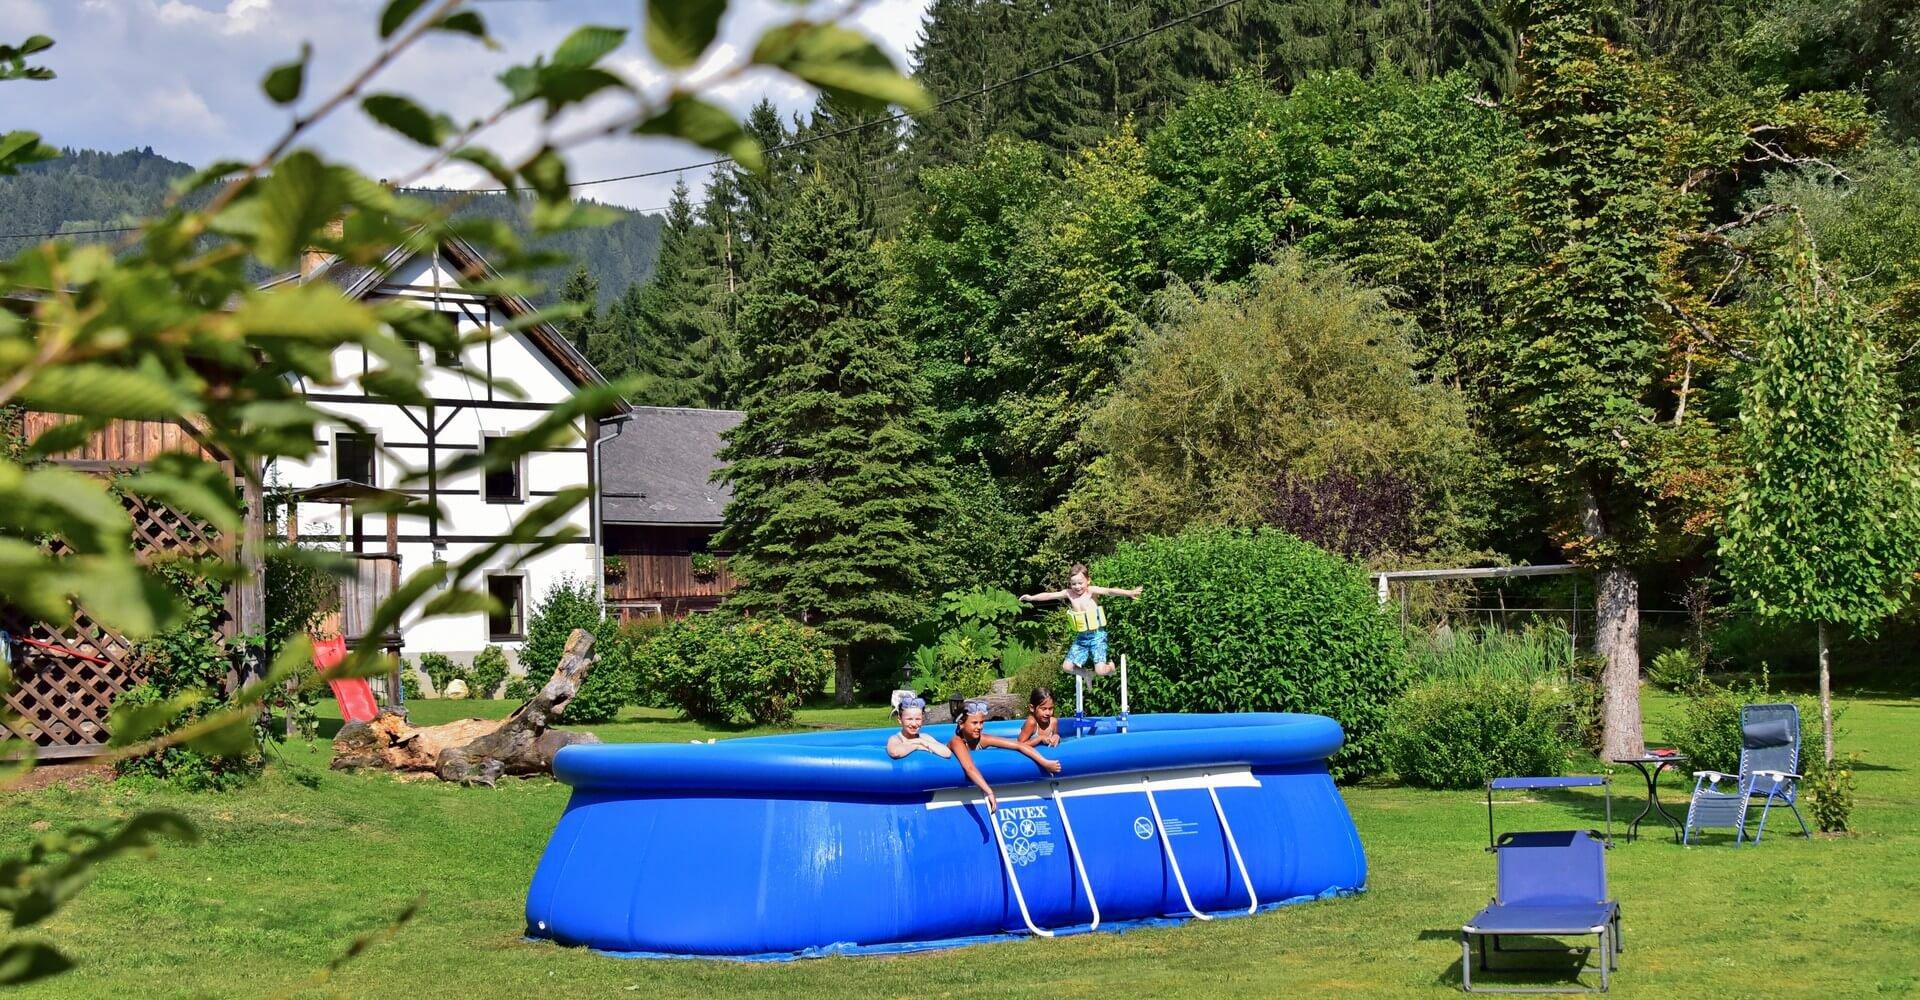 Kinder im Pool bei Familienurlaub in Pension bei Gerlitzen Ossiacher See - zentrale Lage Nähe Villach in Kärnten